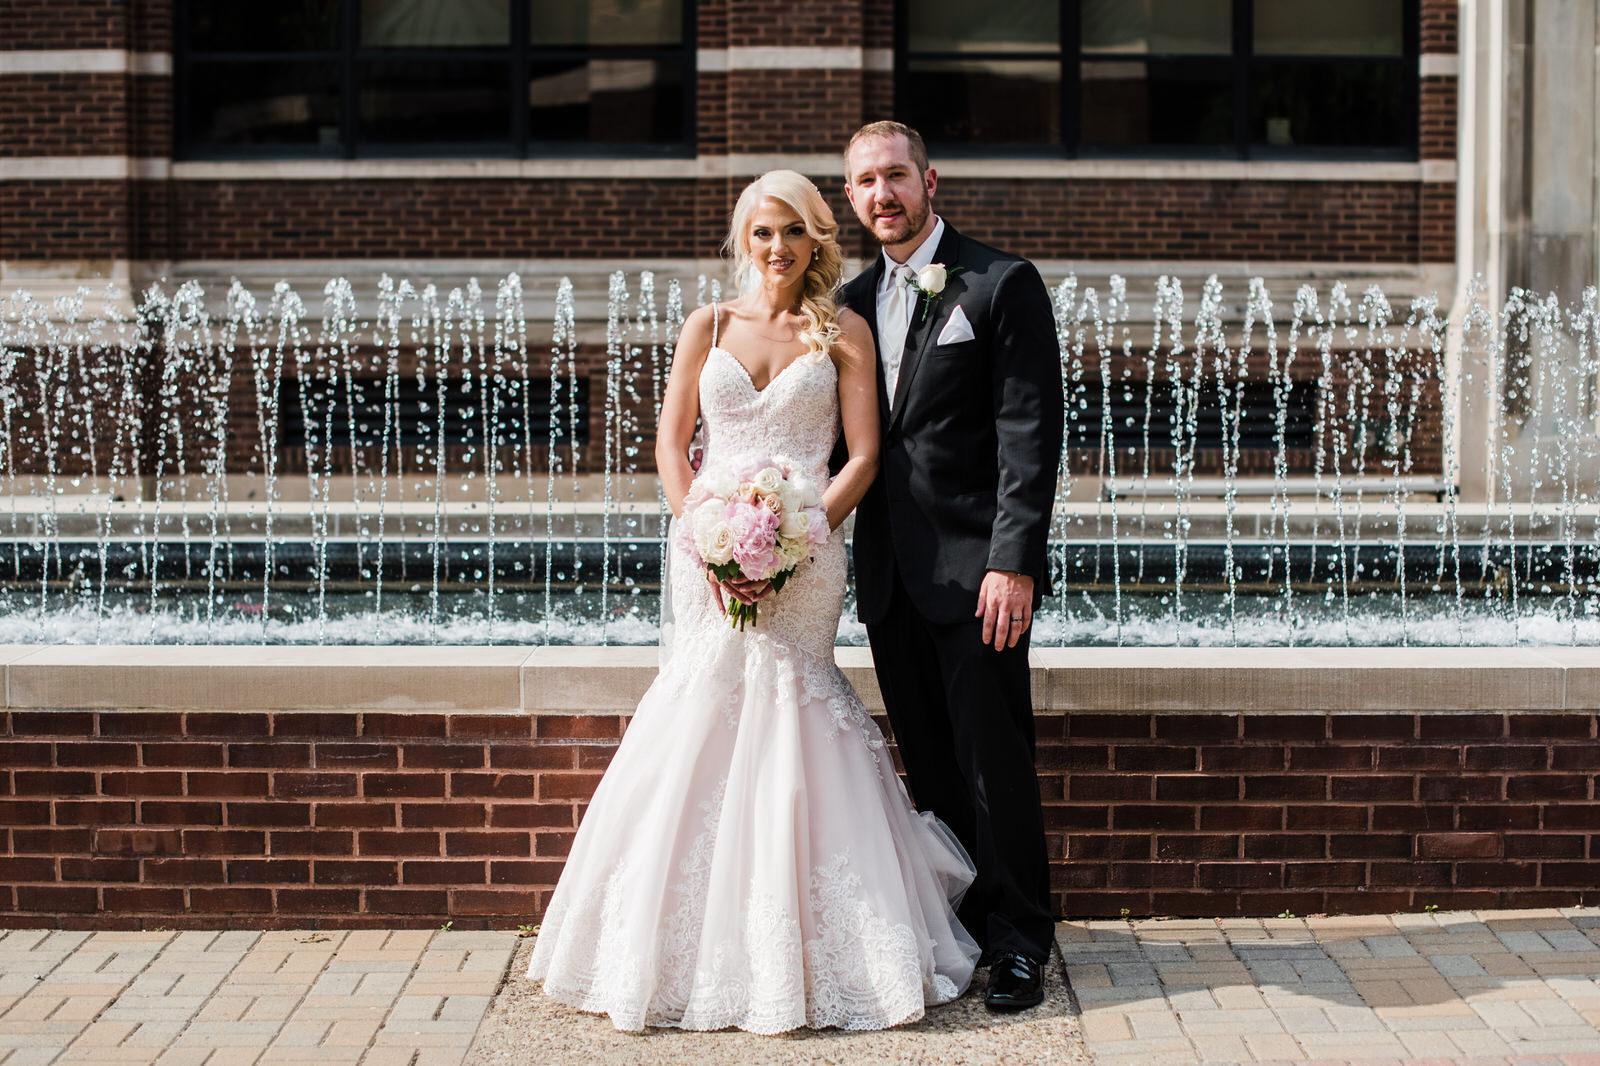 Pittsburgh-Duquesne-University-Wedding-071.jpg